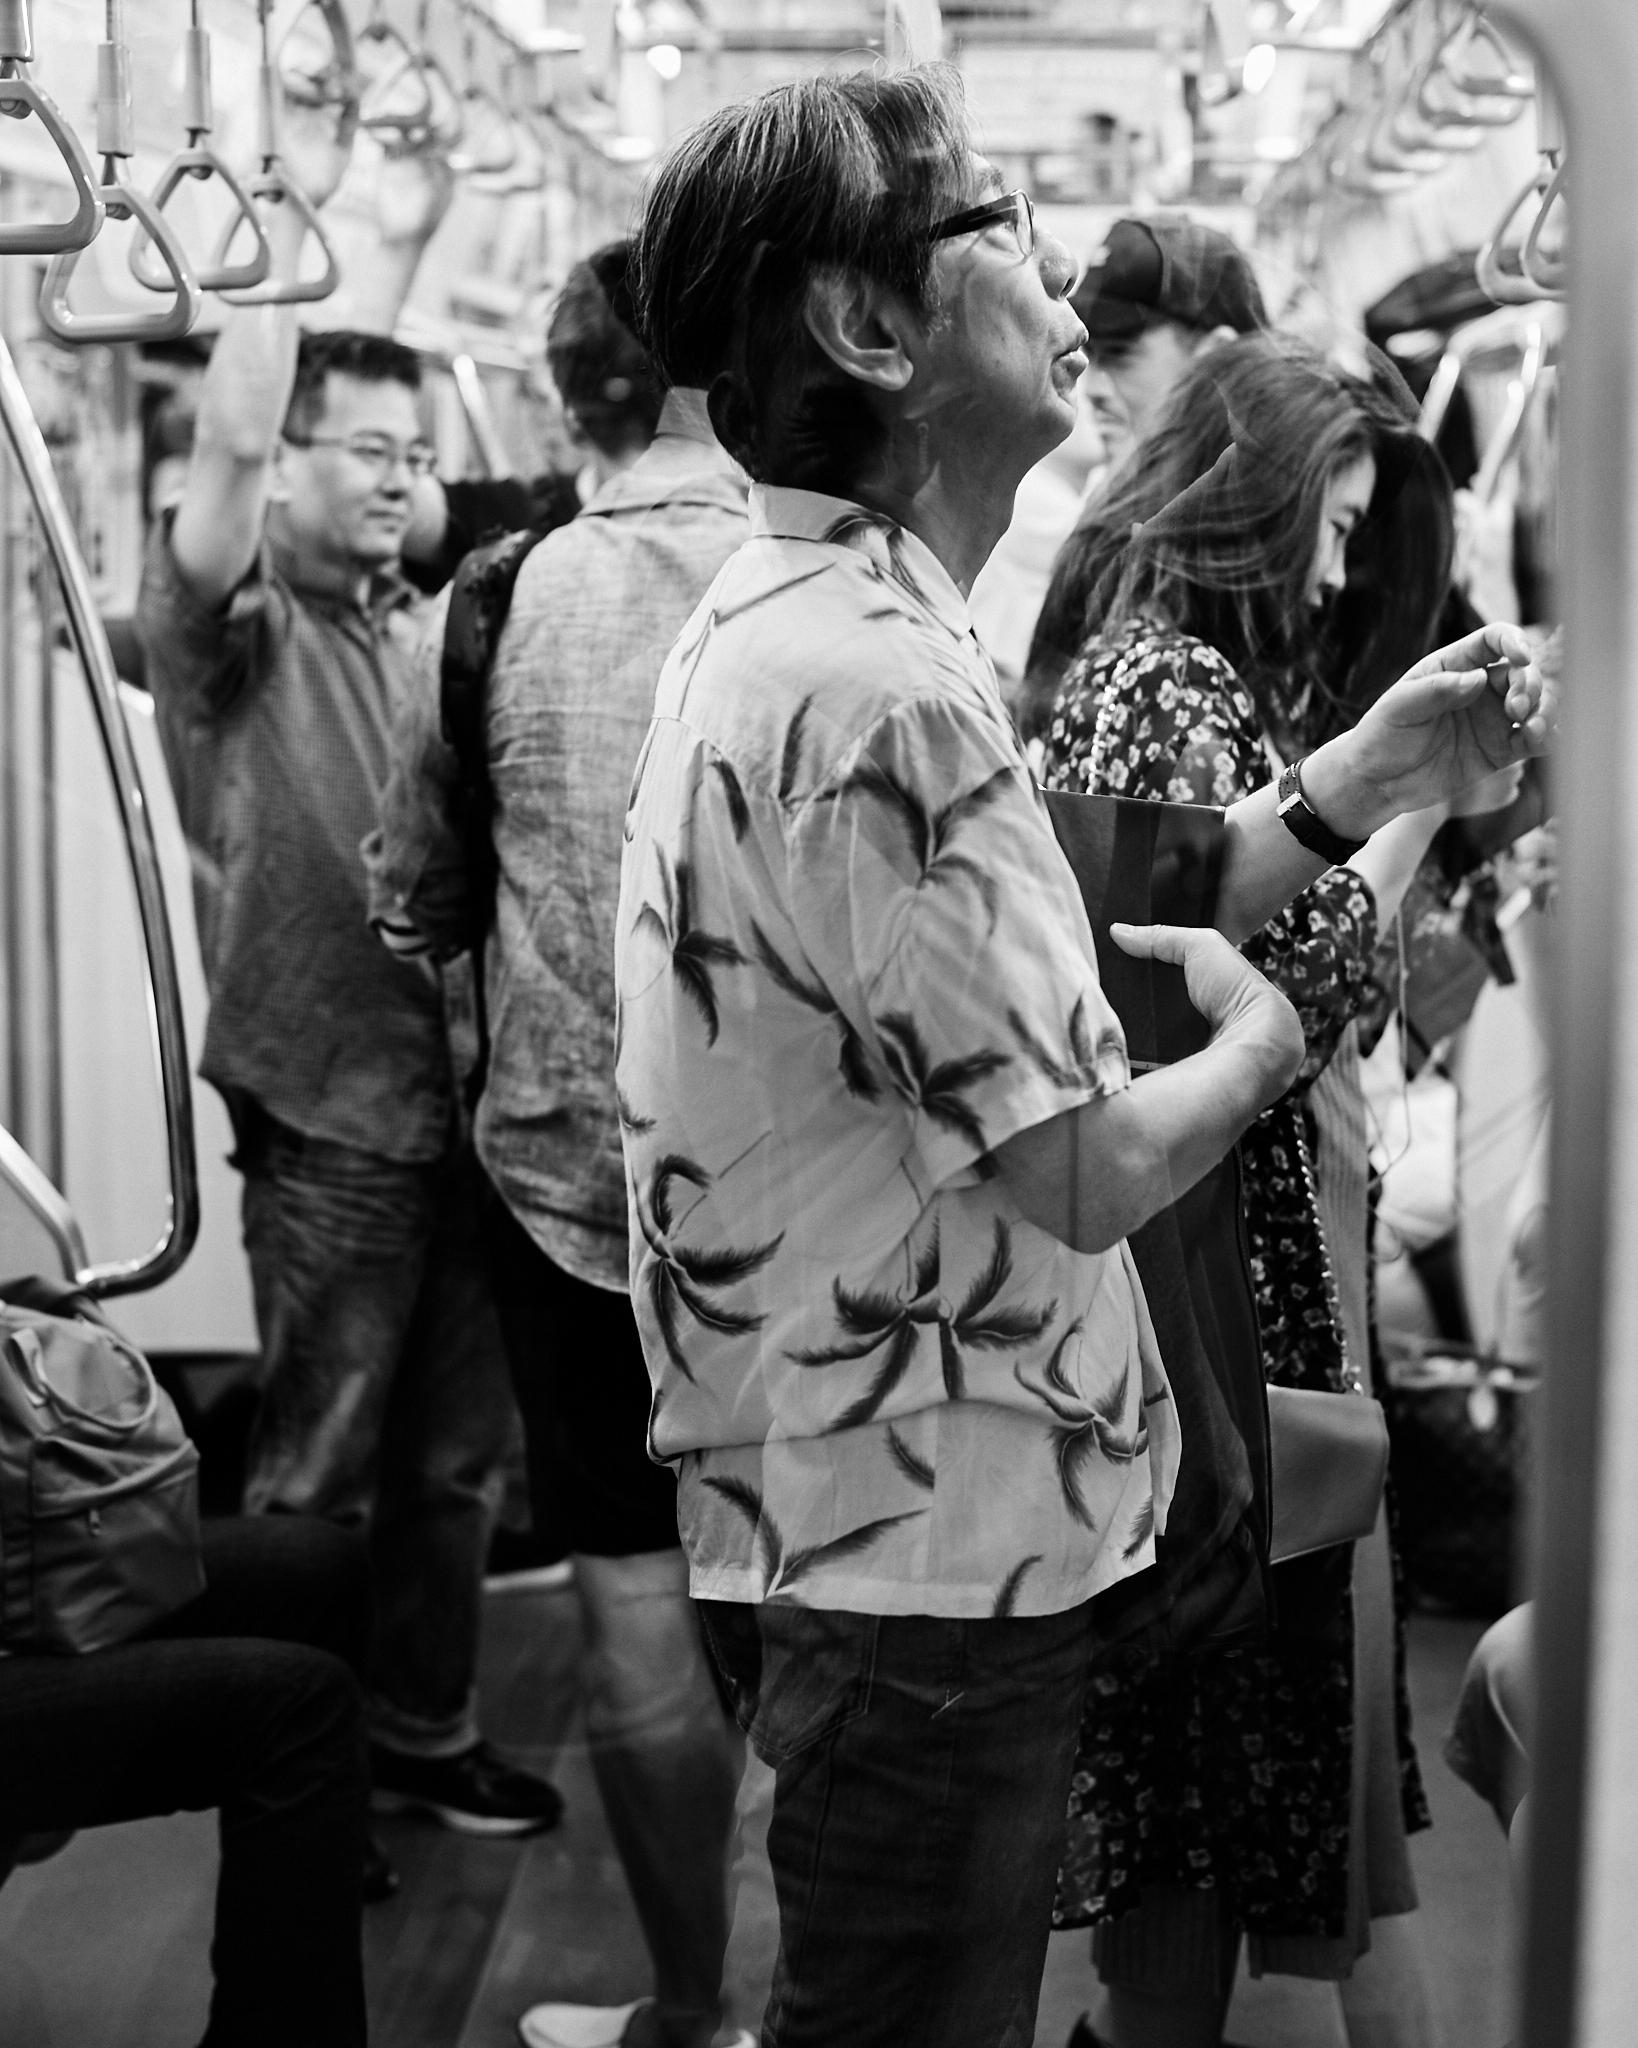 SnapPilots_17-07-07_Tokyo2017_bnw_94.jpg